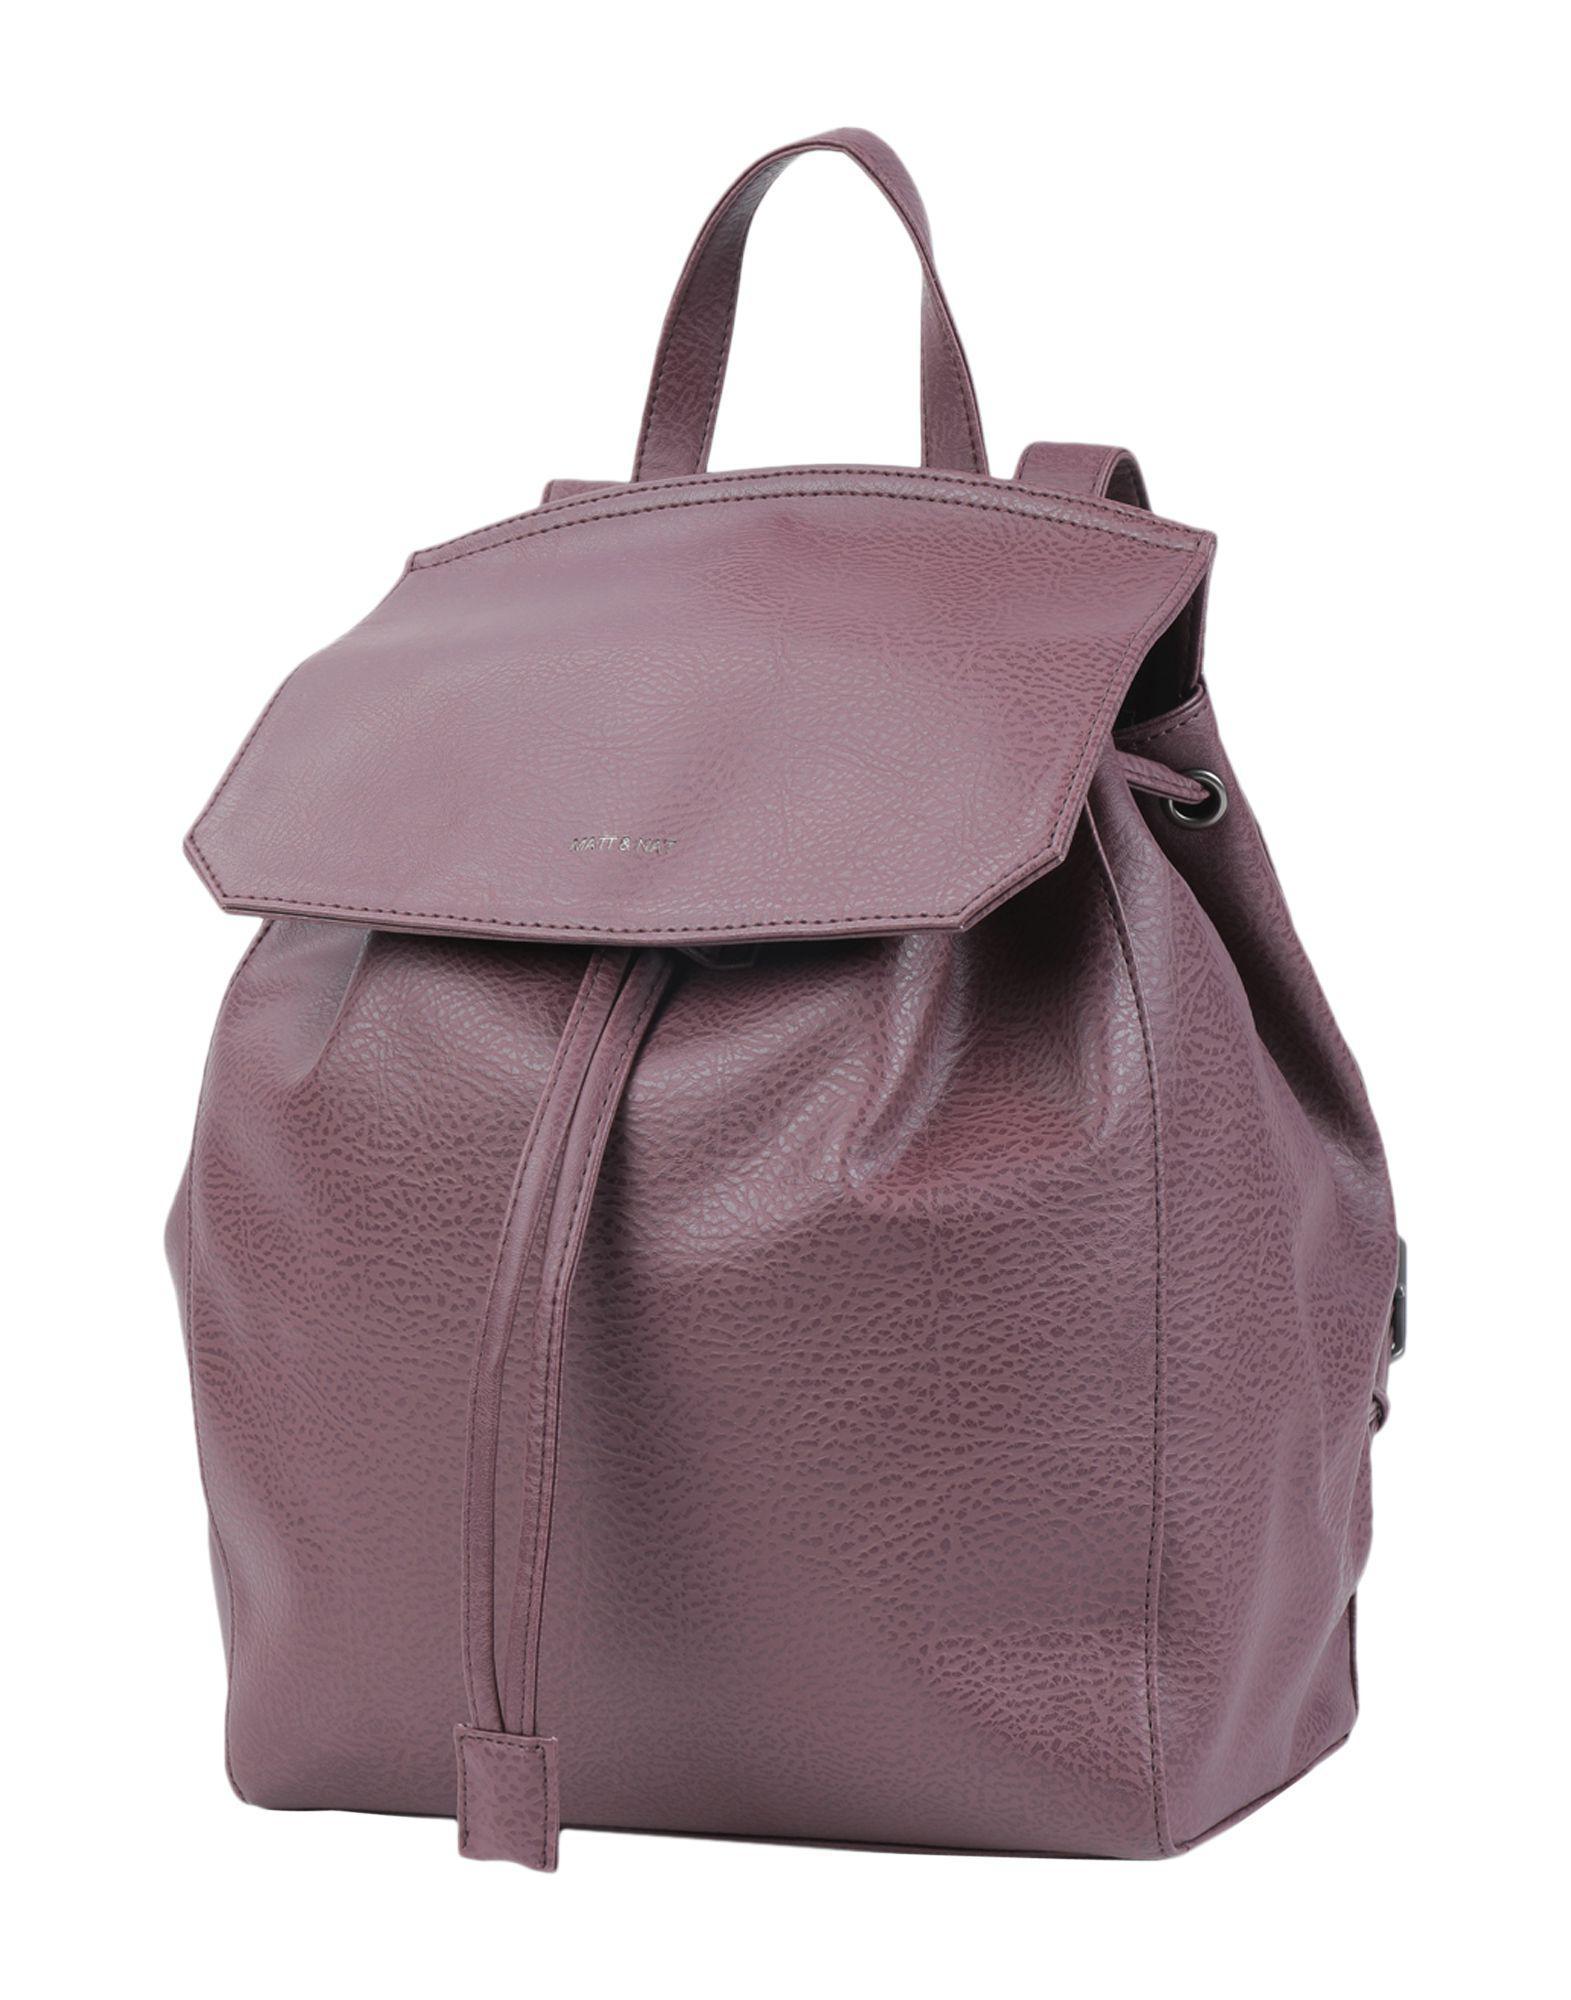 Purple Nat Bum amp; Lyst In Matt Backpacks Bags xqCAvnnUf